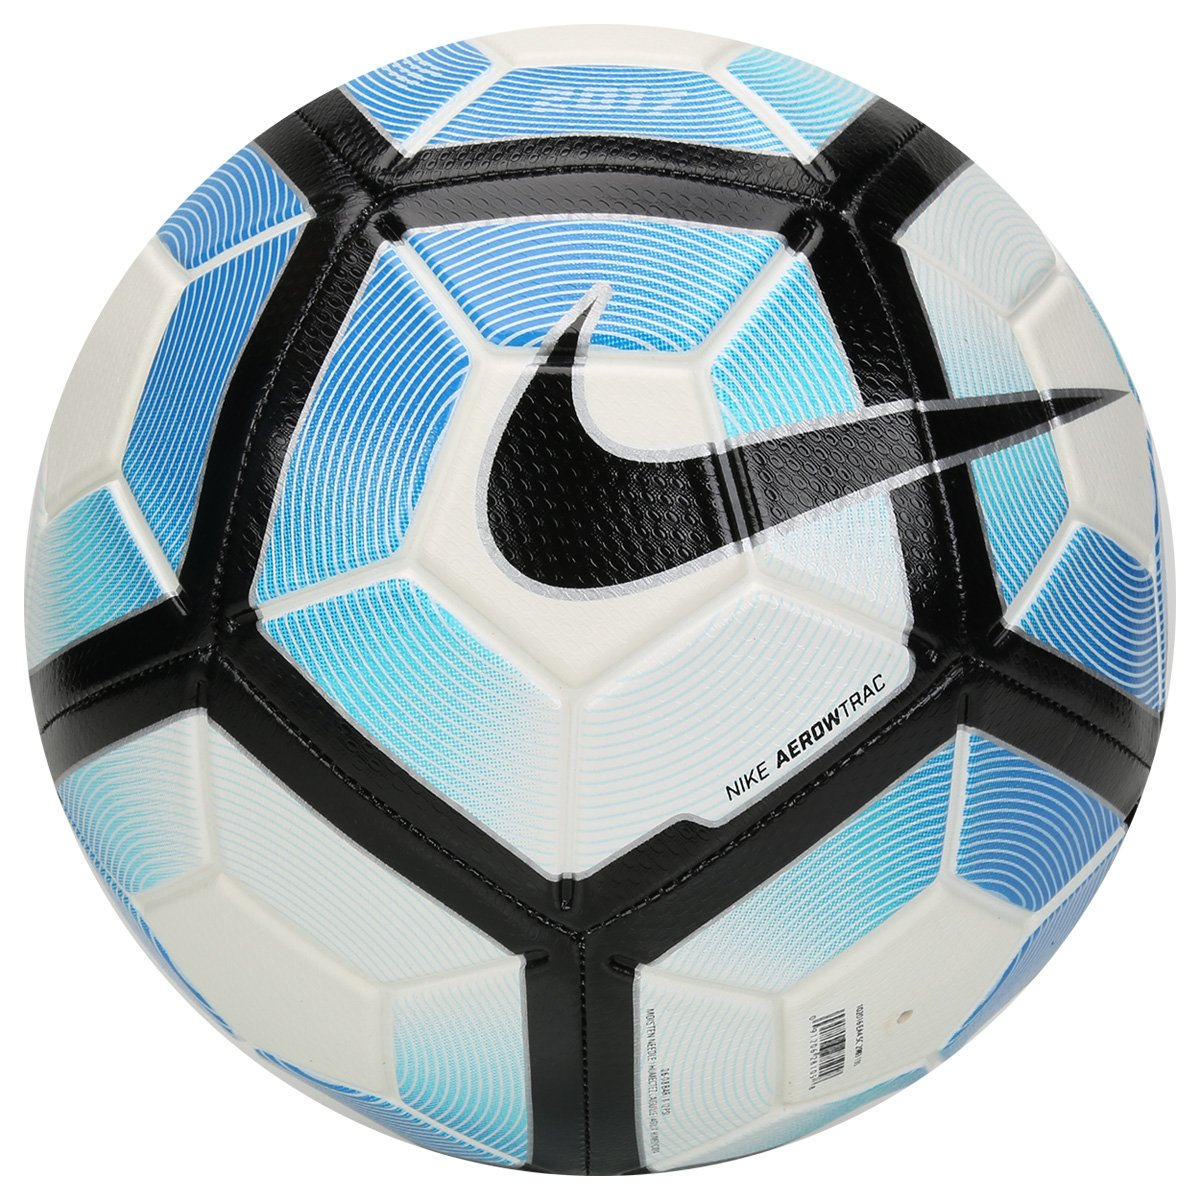 Bola Futebol Campo Nike Strike - Compre Agora  49fbb06b73251